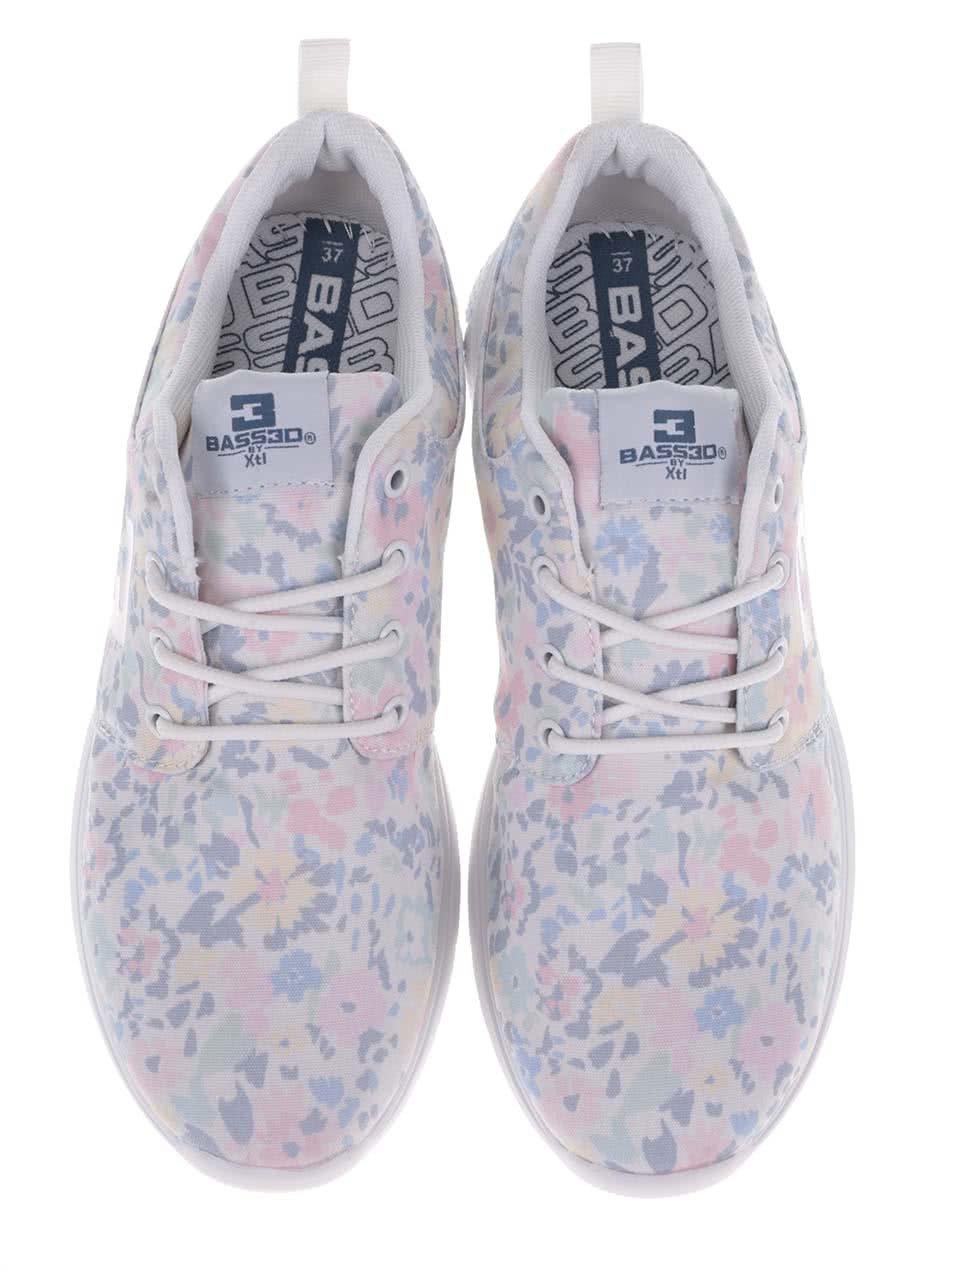 1c6fab91a8a2f Biele dámske kvetované tenisky Bassed | ZOOT.sk